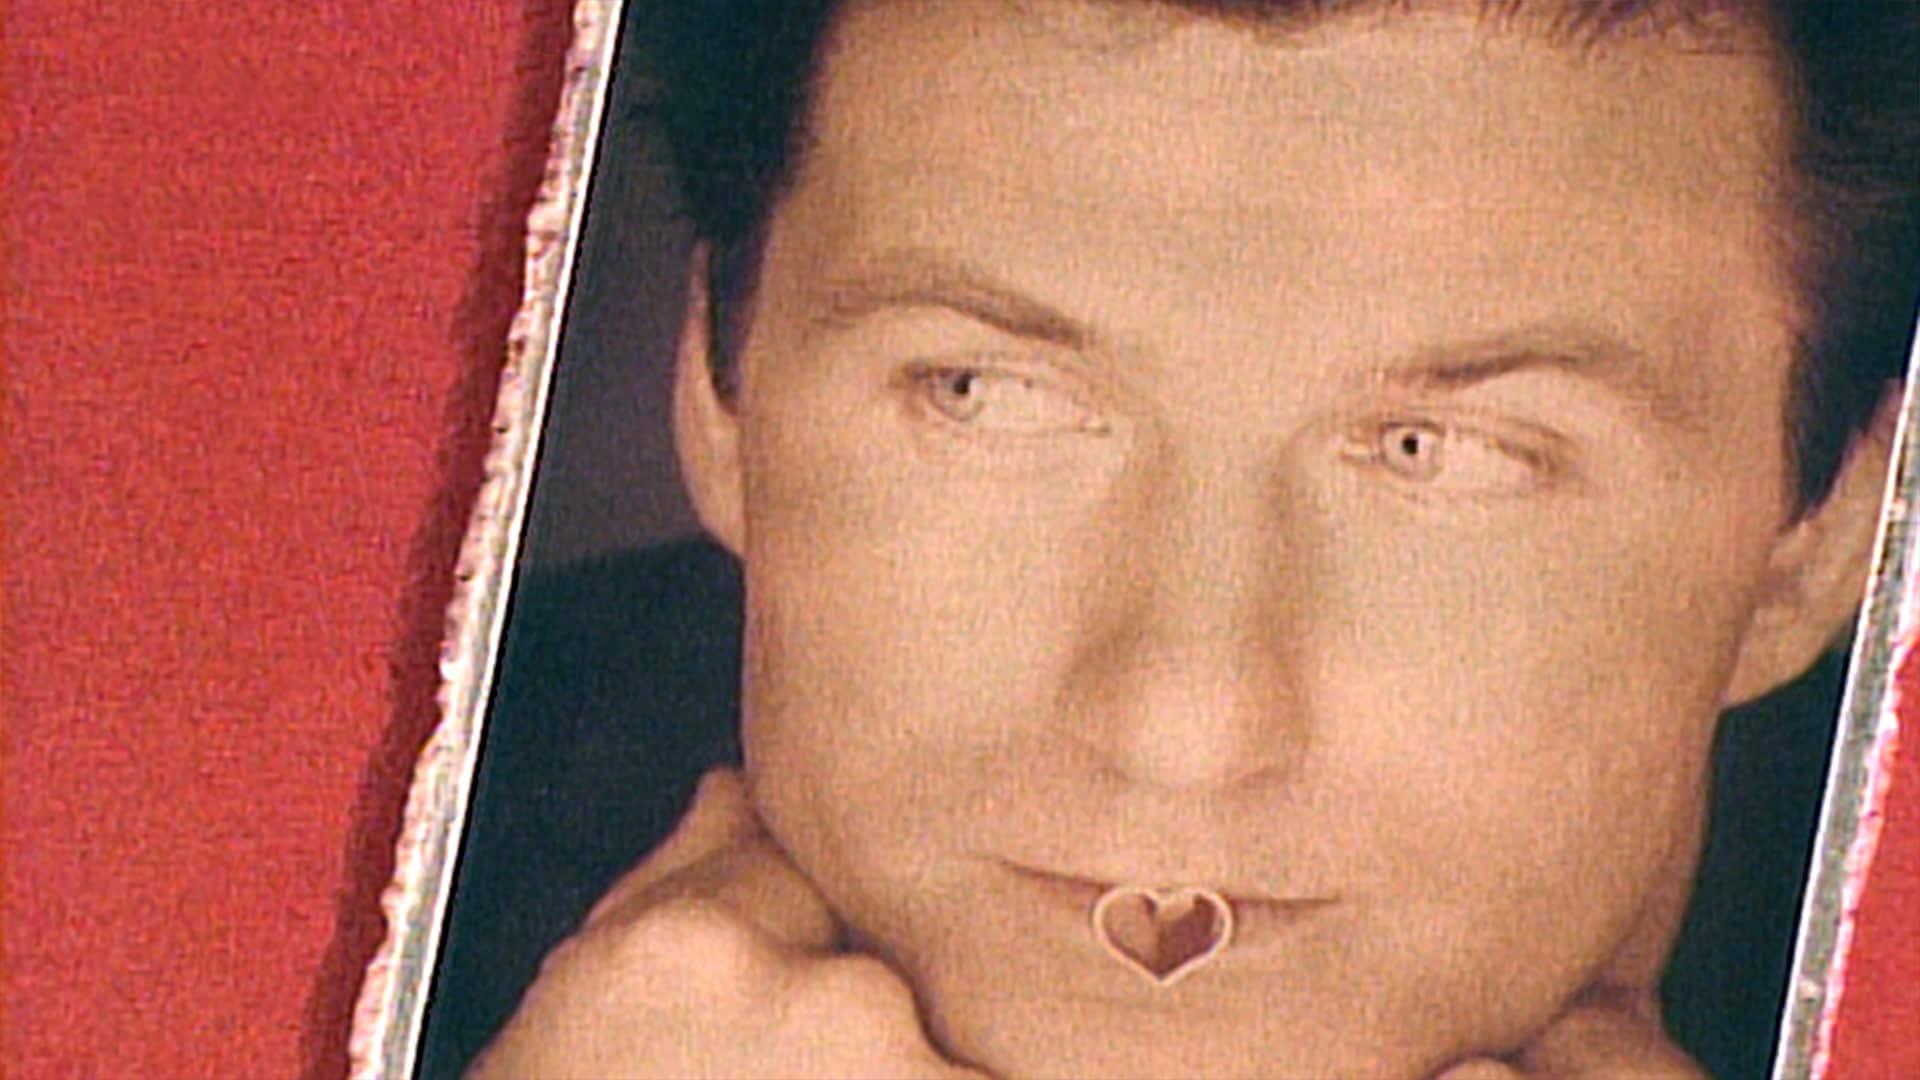 Alec Baldwin: February 13, 1993